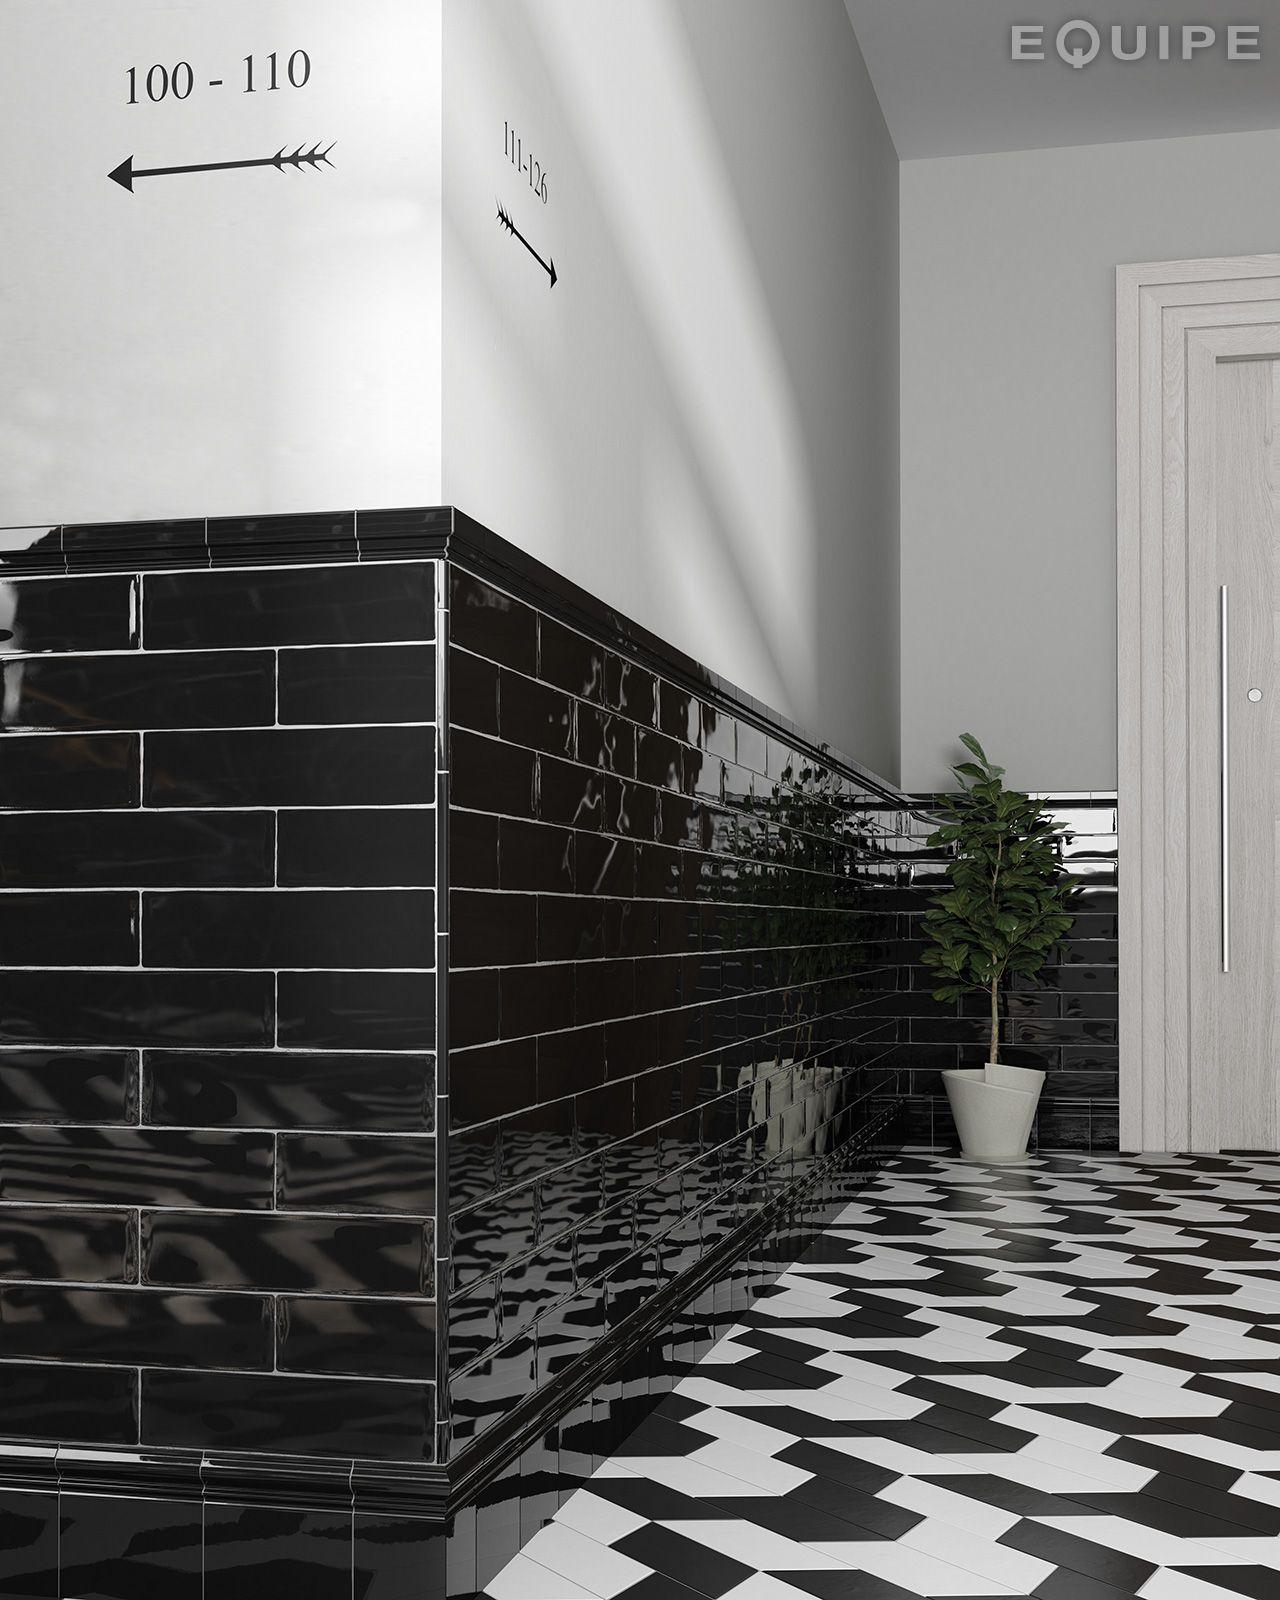 Vanite Salle De Bain Ciot ~ mas a negro 7 5×30 skirting negro 15×15 m naco negro 5×15 jolly